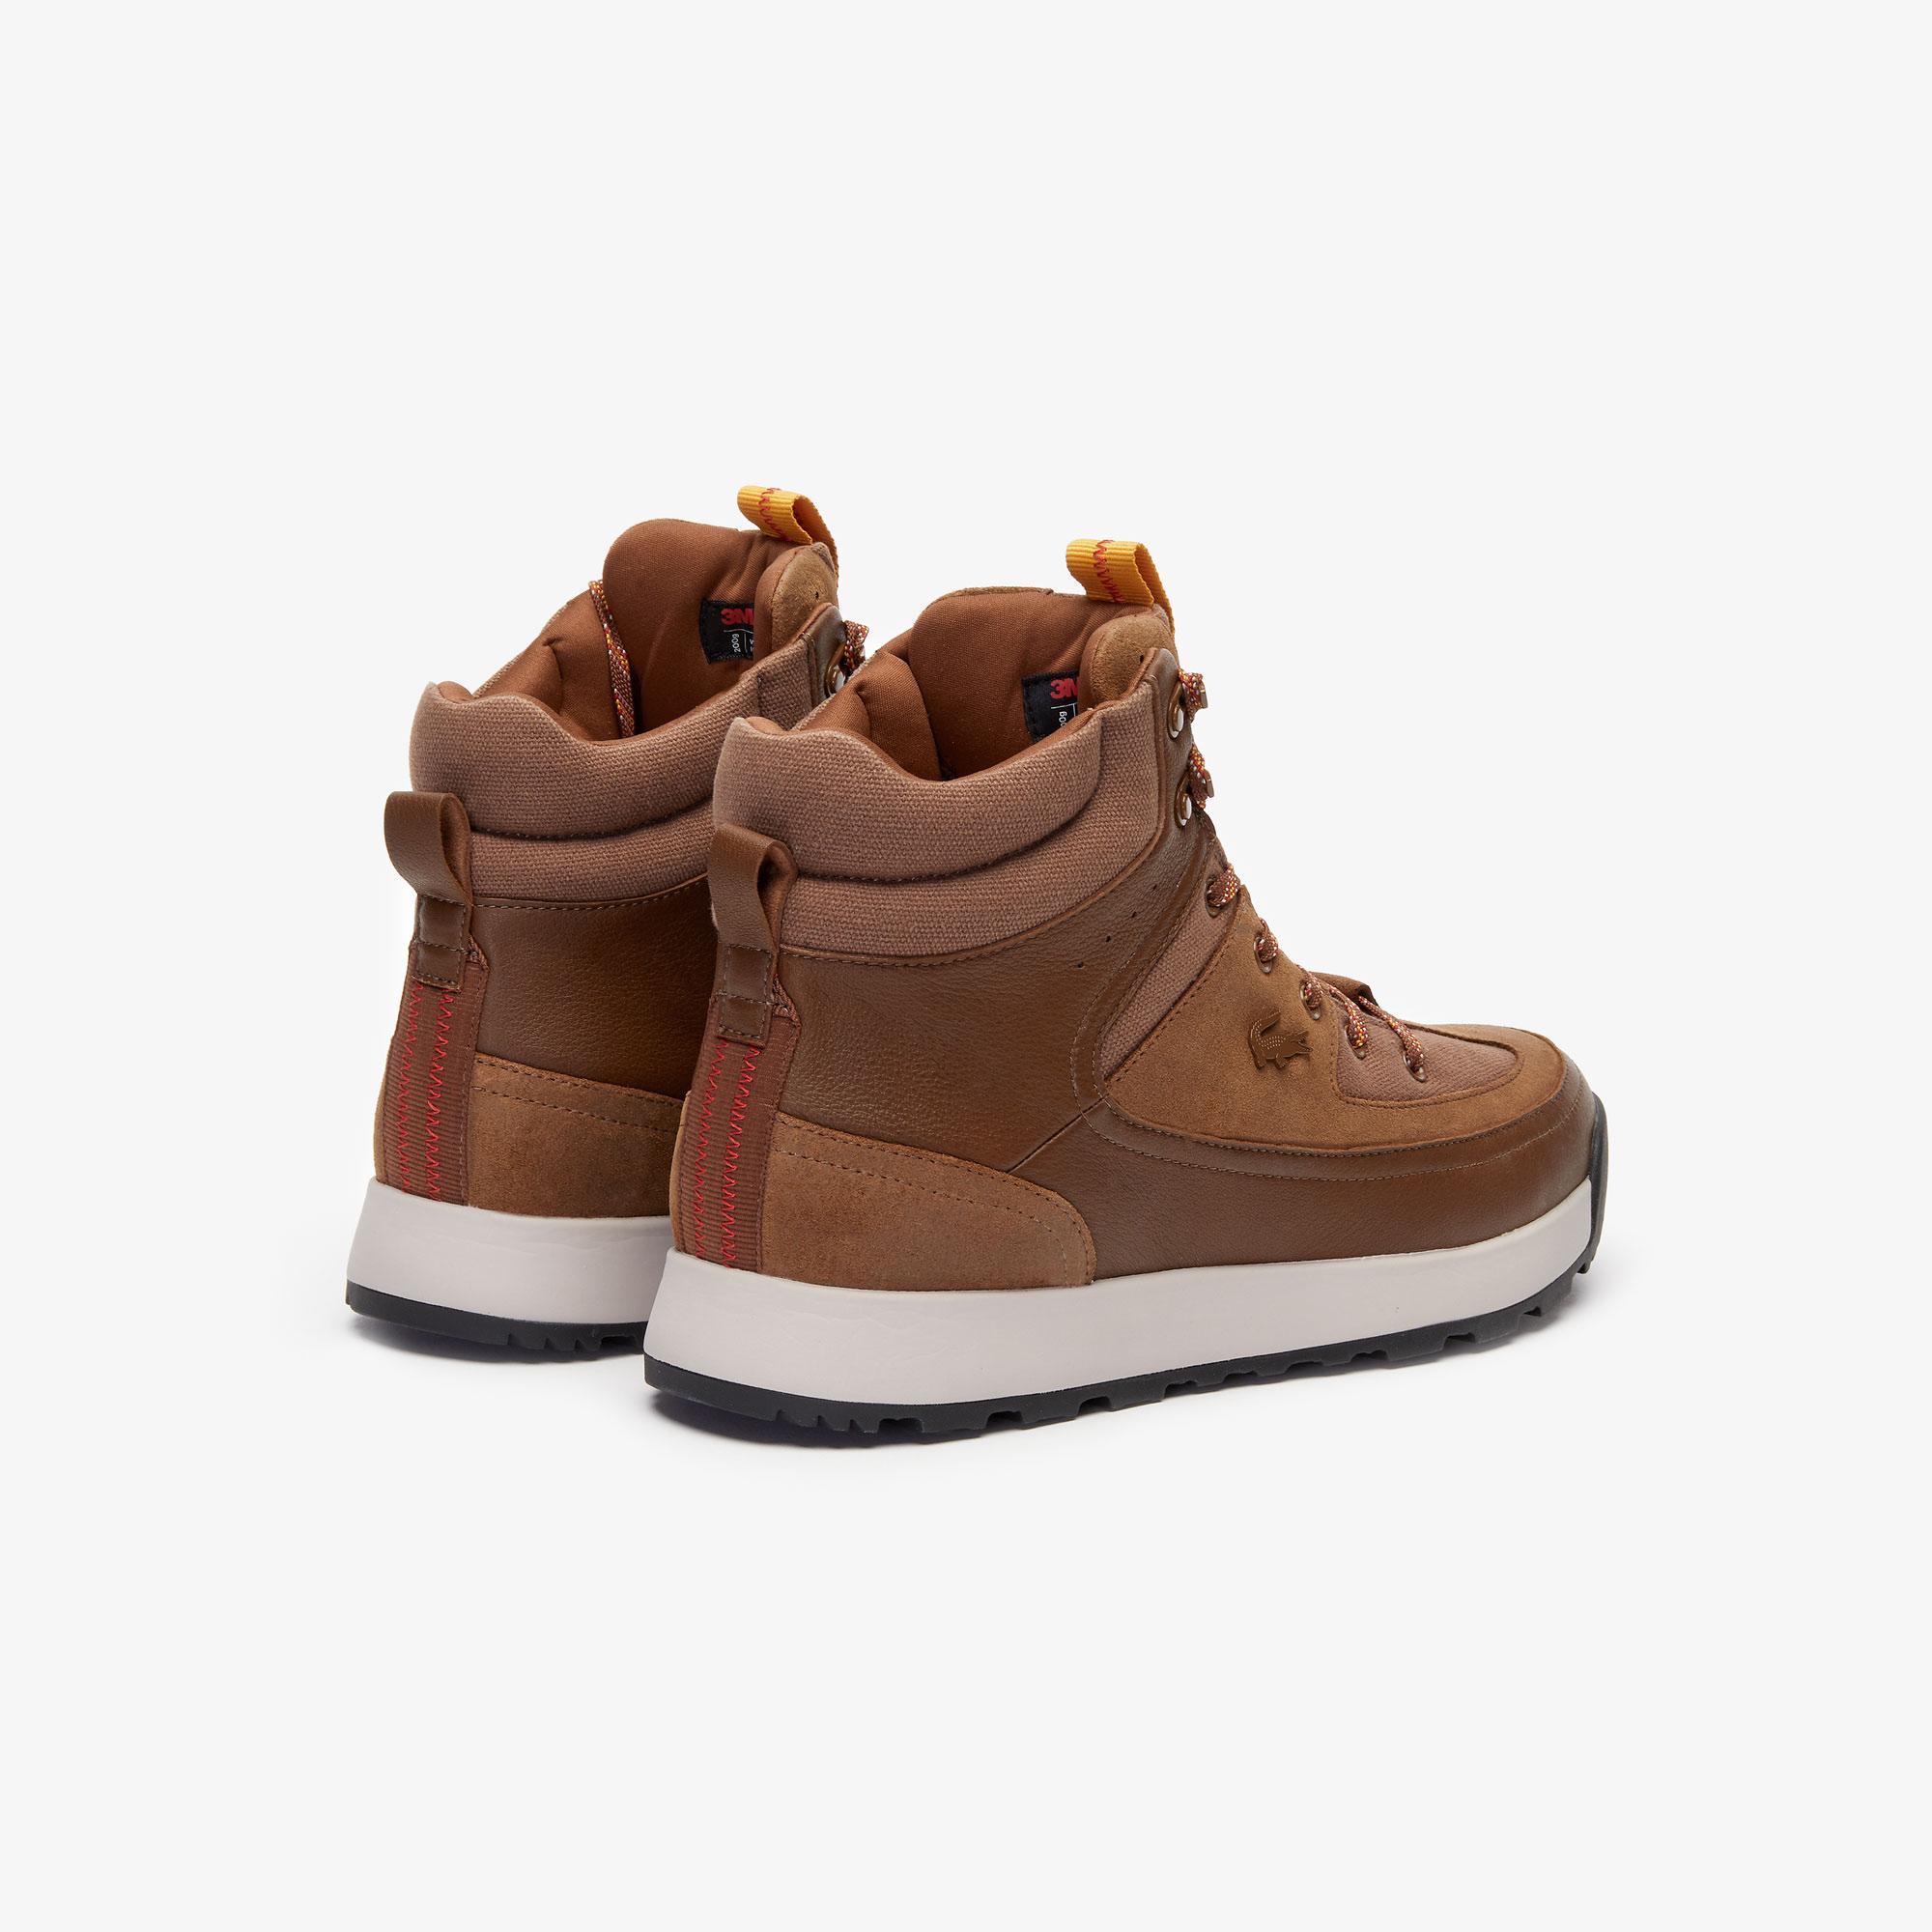 Lacoste Men's Urban Breaker 319 1 Cma Boots